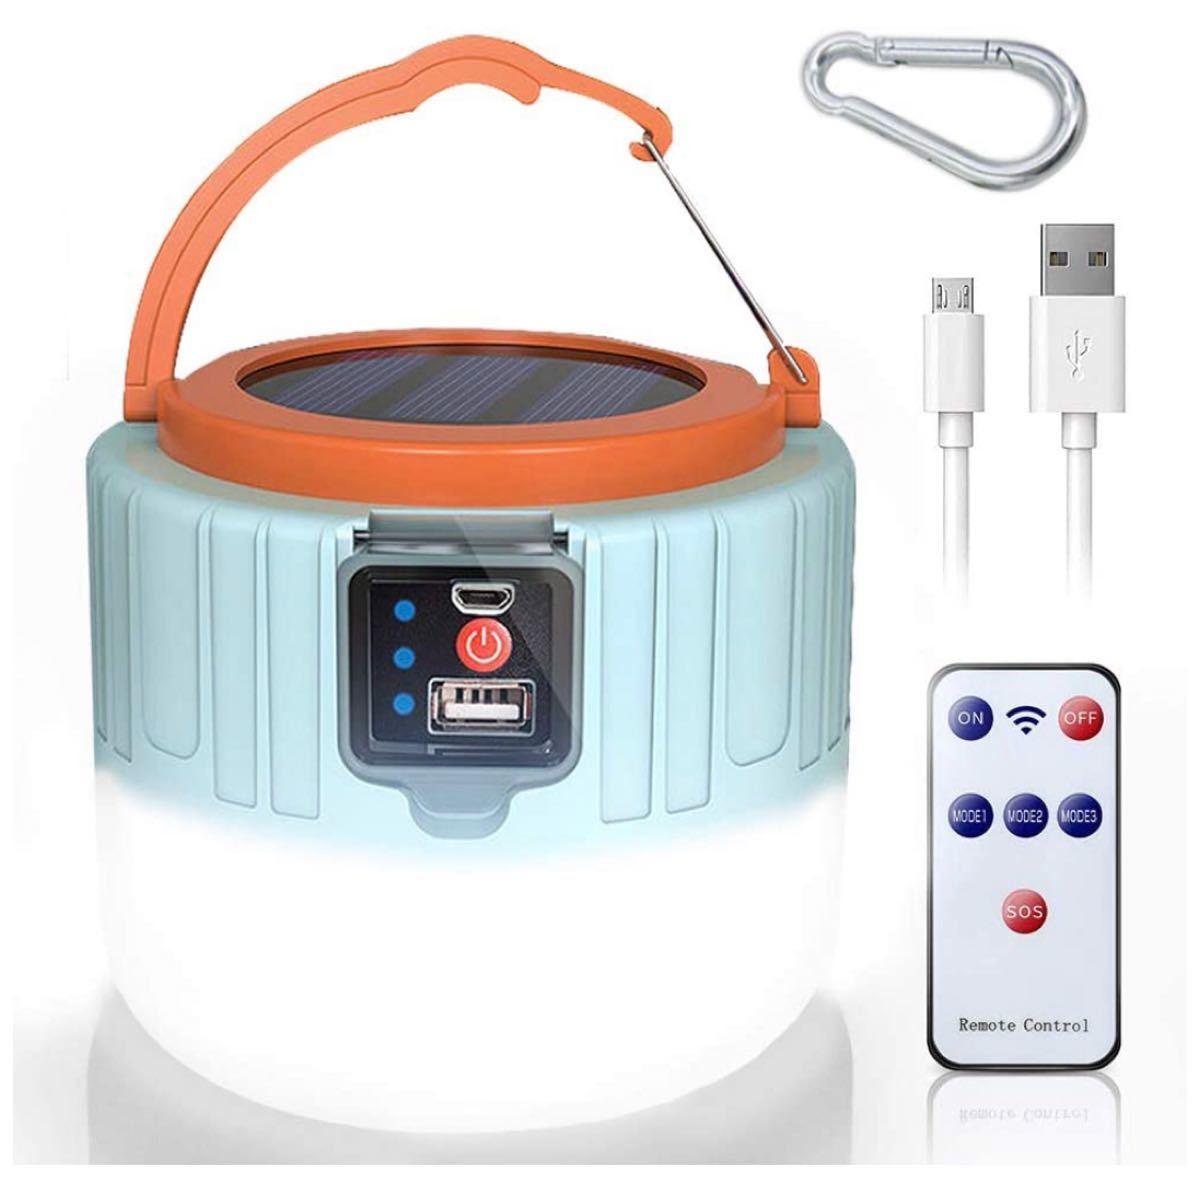 LEDランタン キャンプランタン 3色切替 ソーラーランタン usb充電可 リモコン 小型 防水仕様